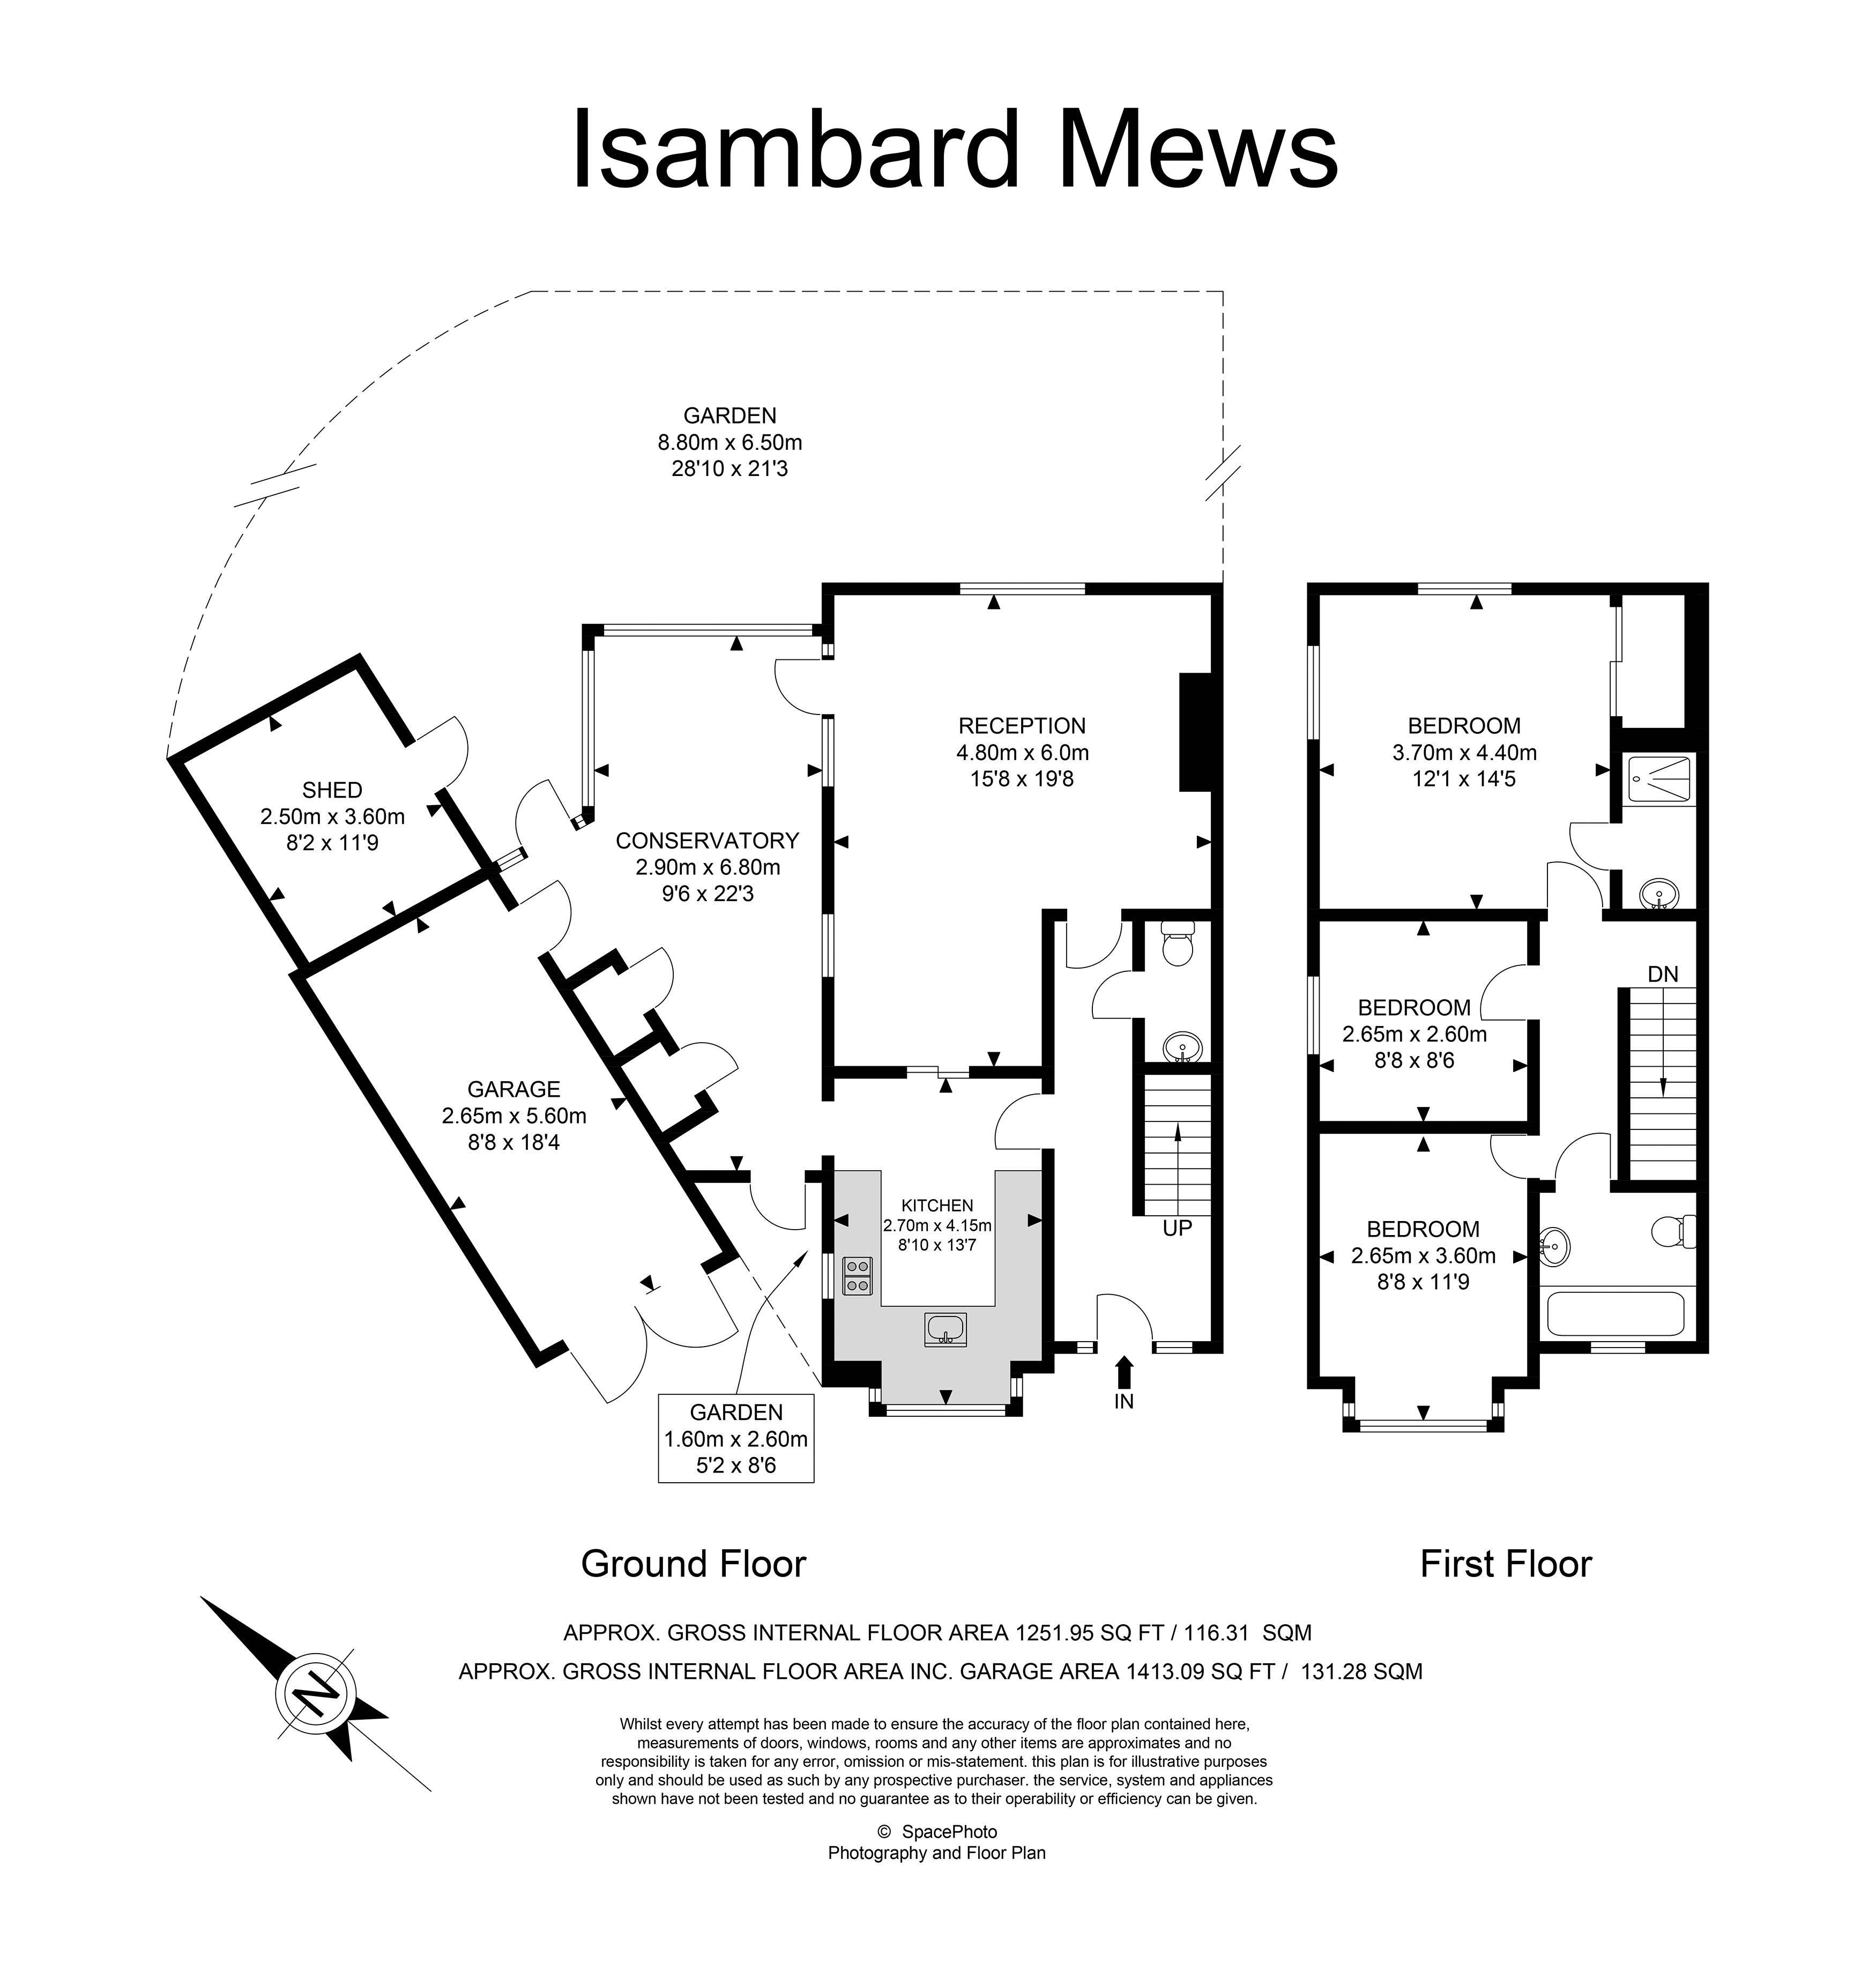 Isambard Mews, Isle of Dogs